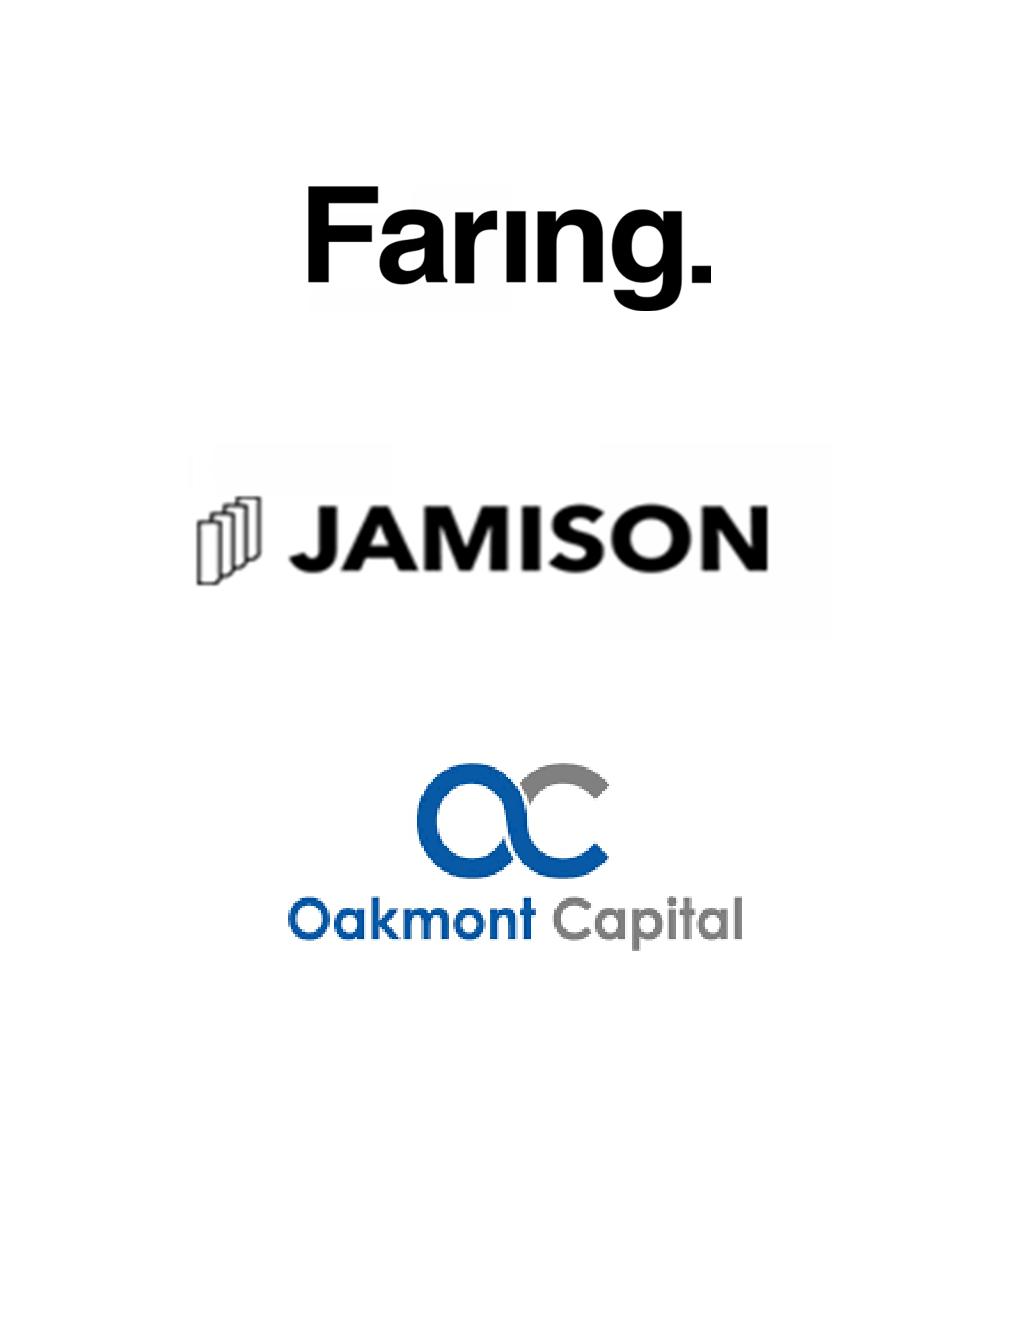 Client Logos 10.png